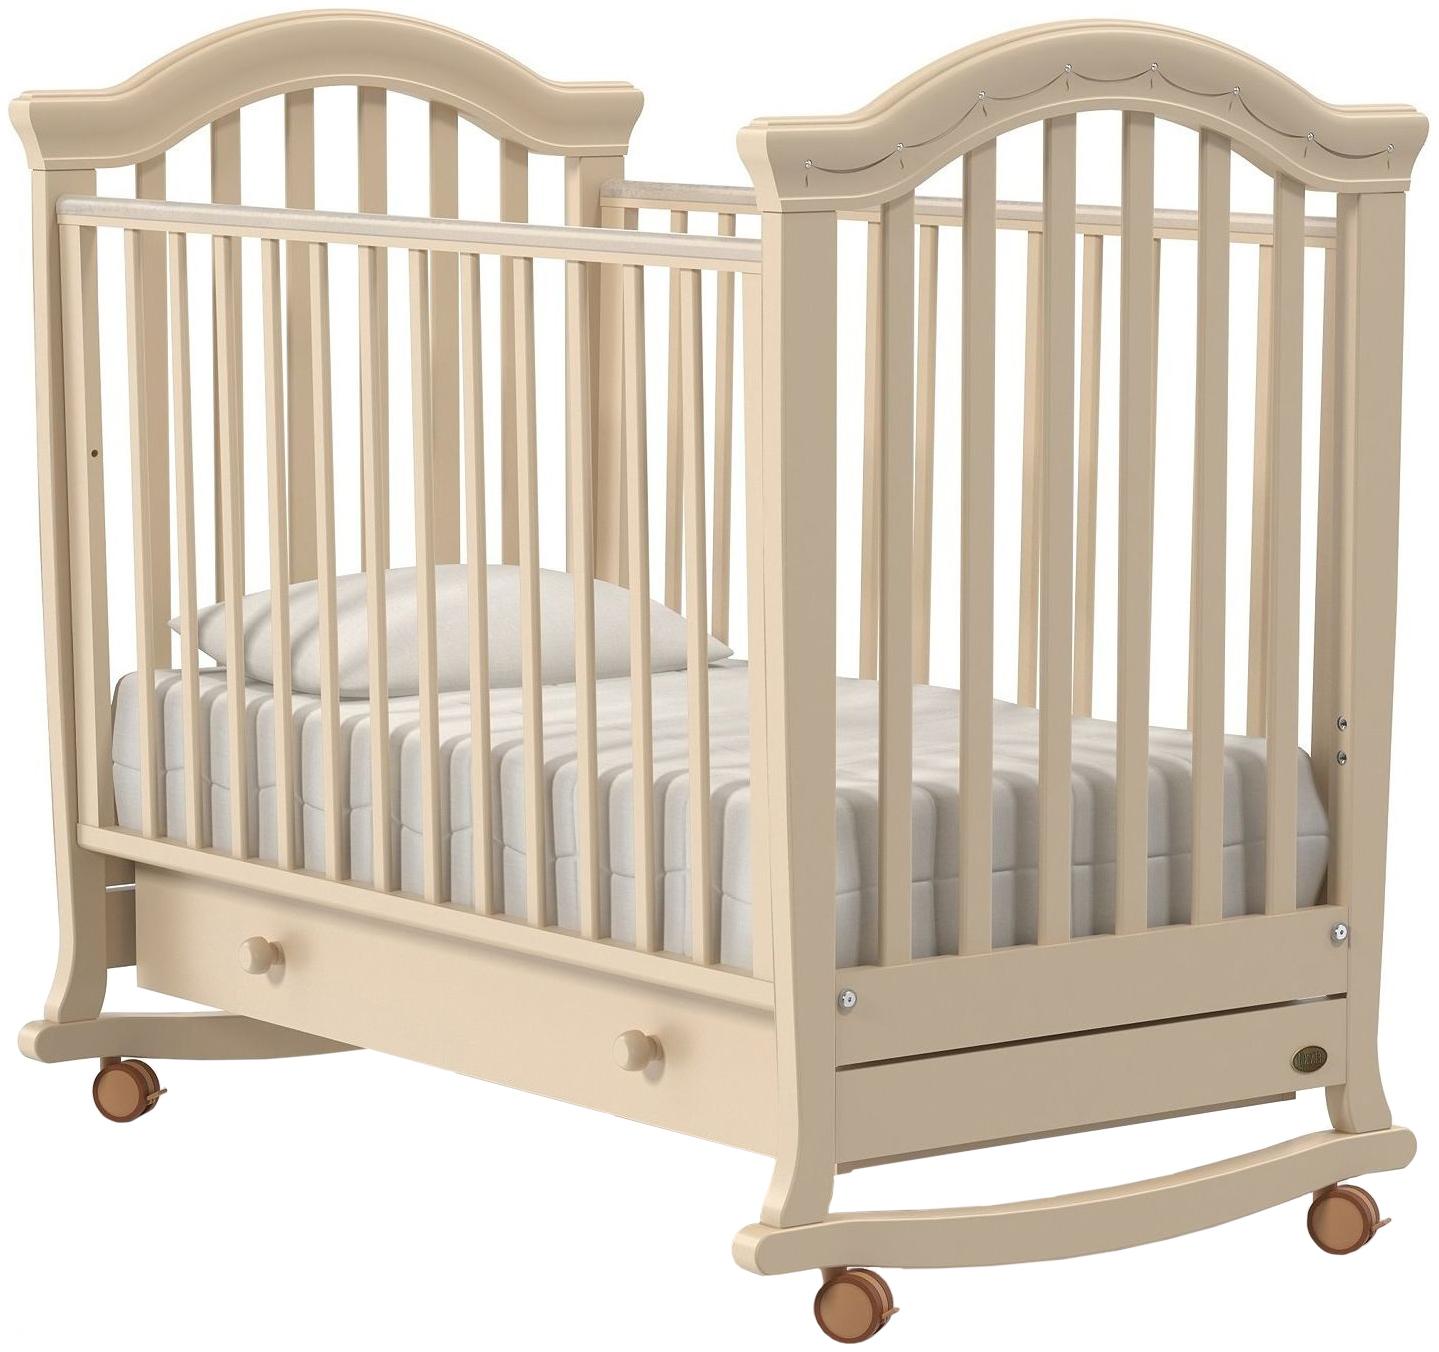 Кроватка Nuovita Perla Dondolo колесо-качалка avorio слоновая кость фото